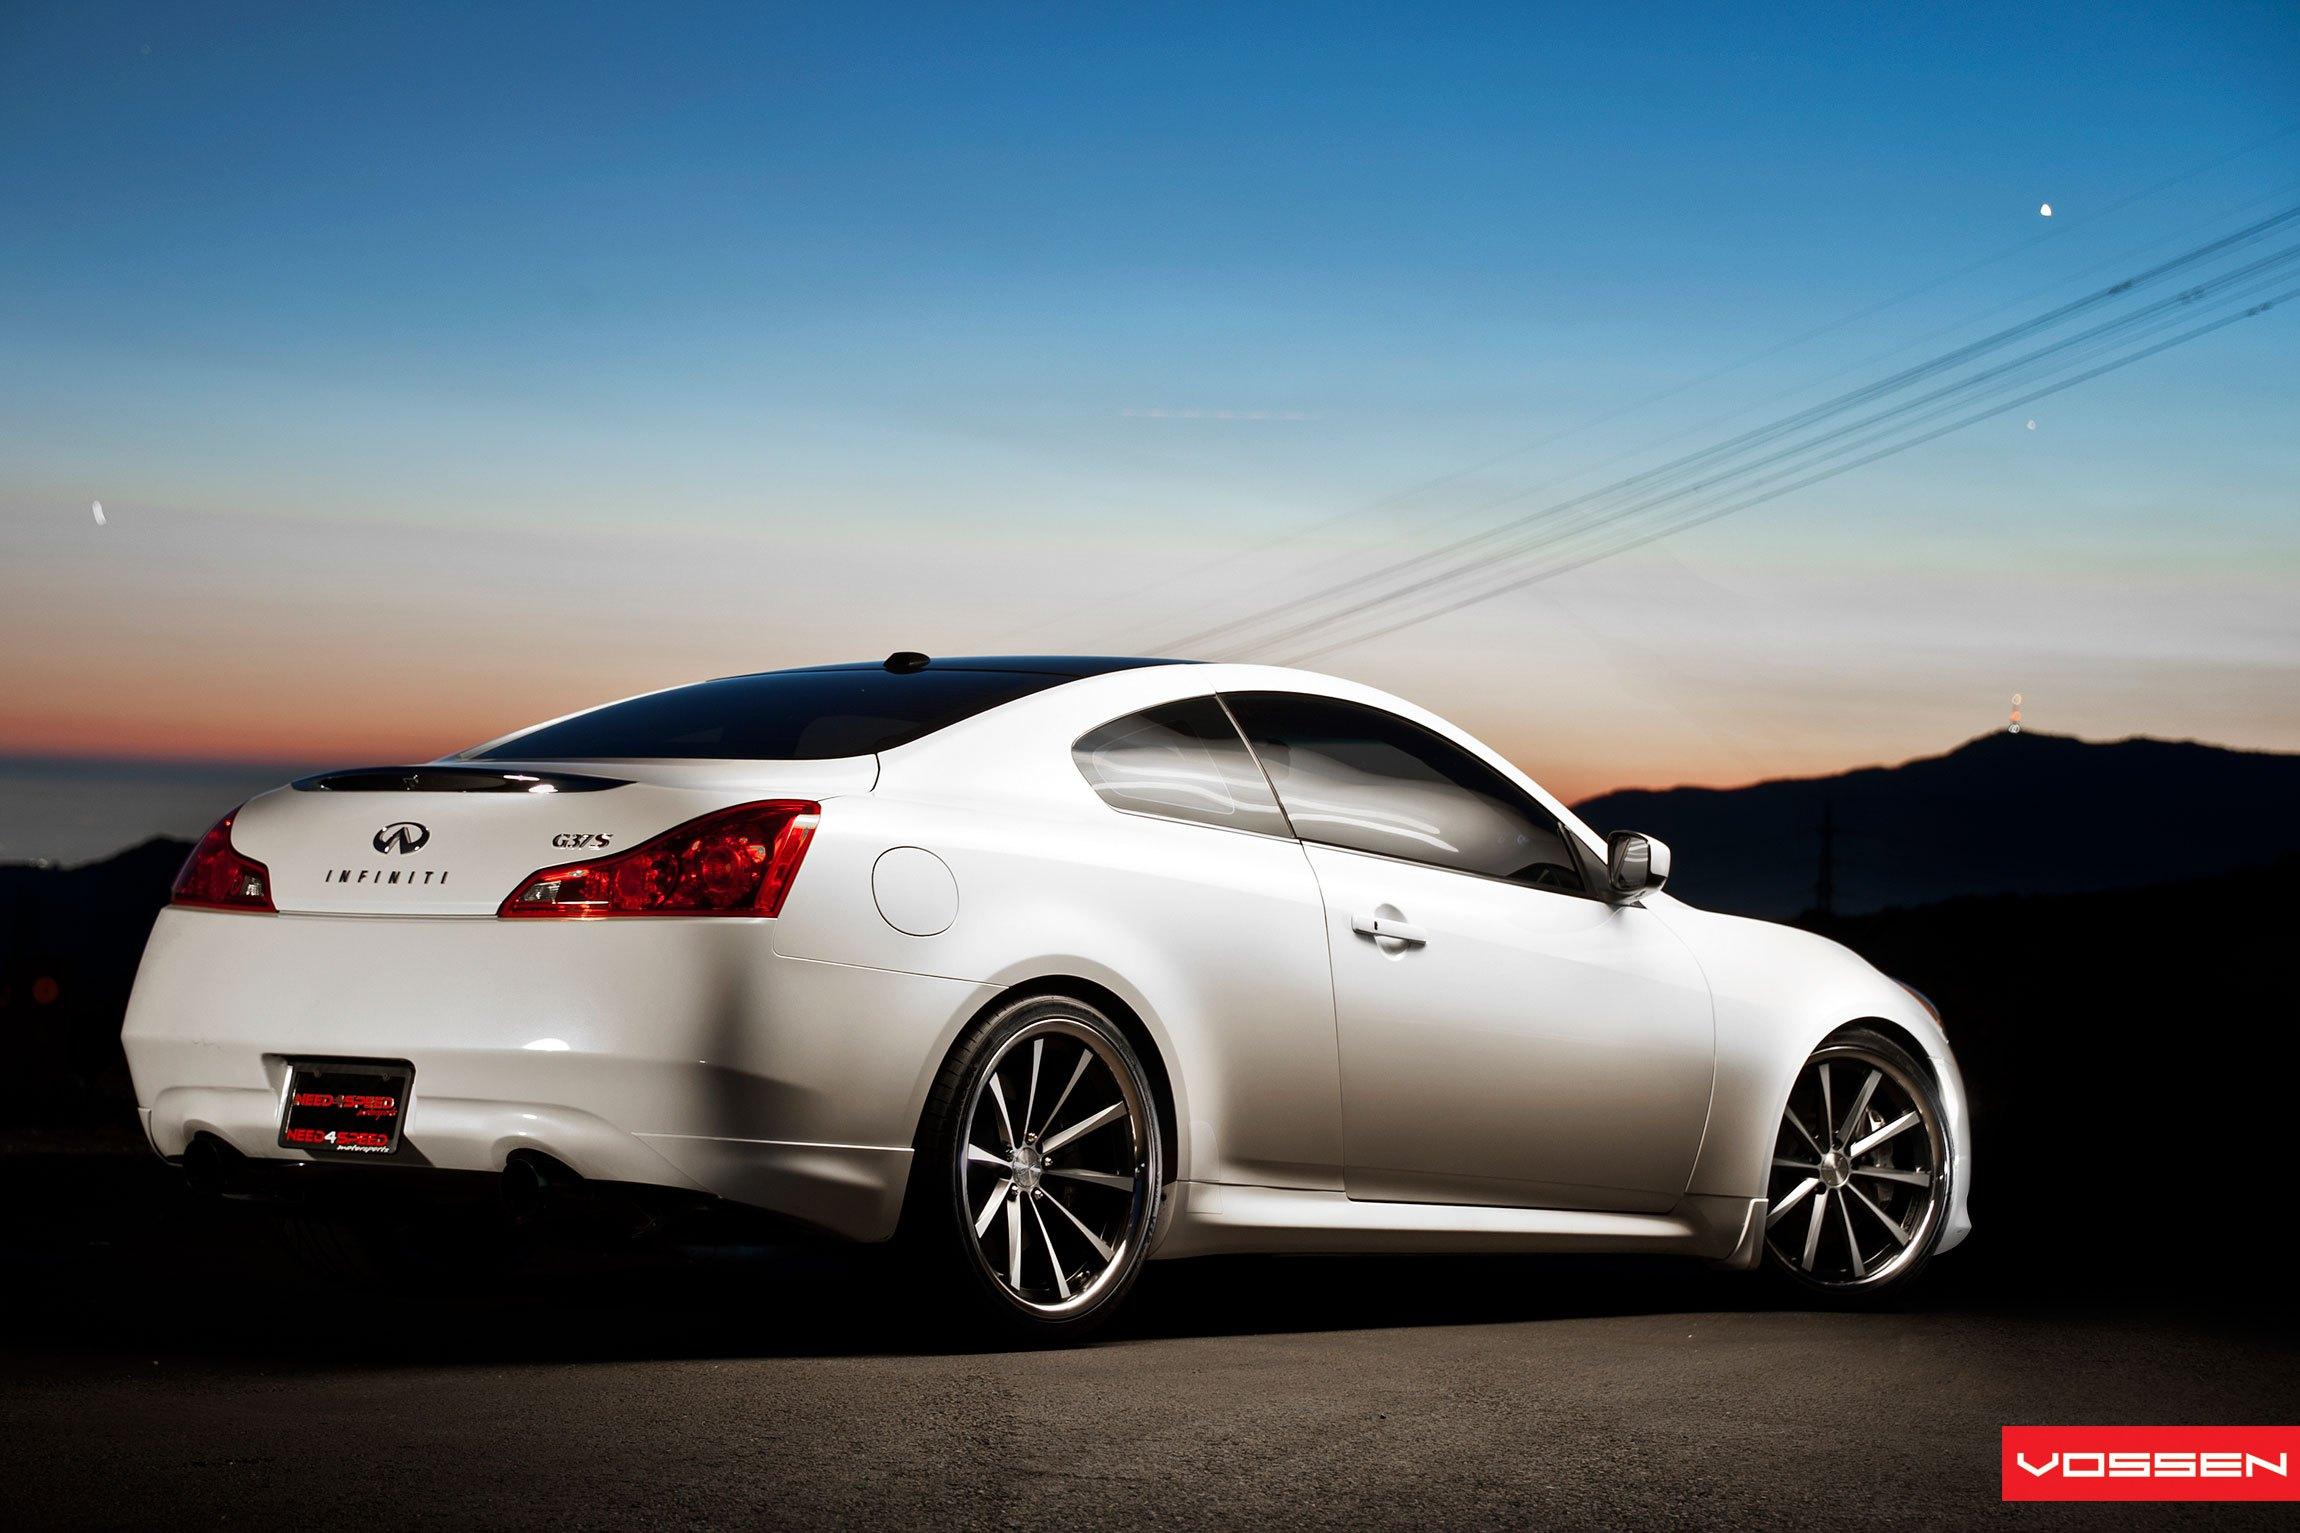 Pearl White Infiniti G37 Boasting Forged Rims By Vossen Back Bumper Custom Rear On S Photo